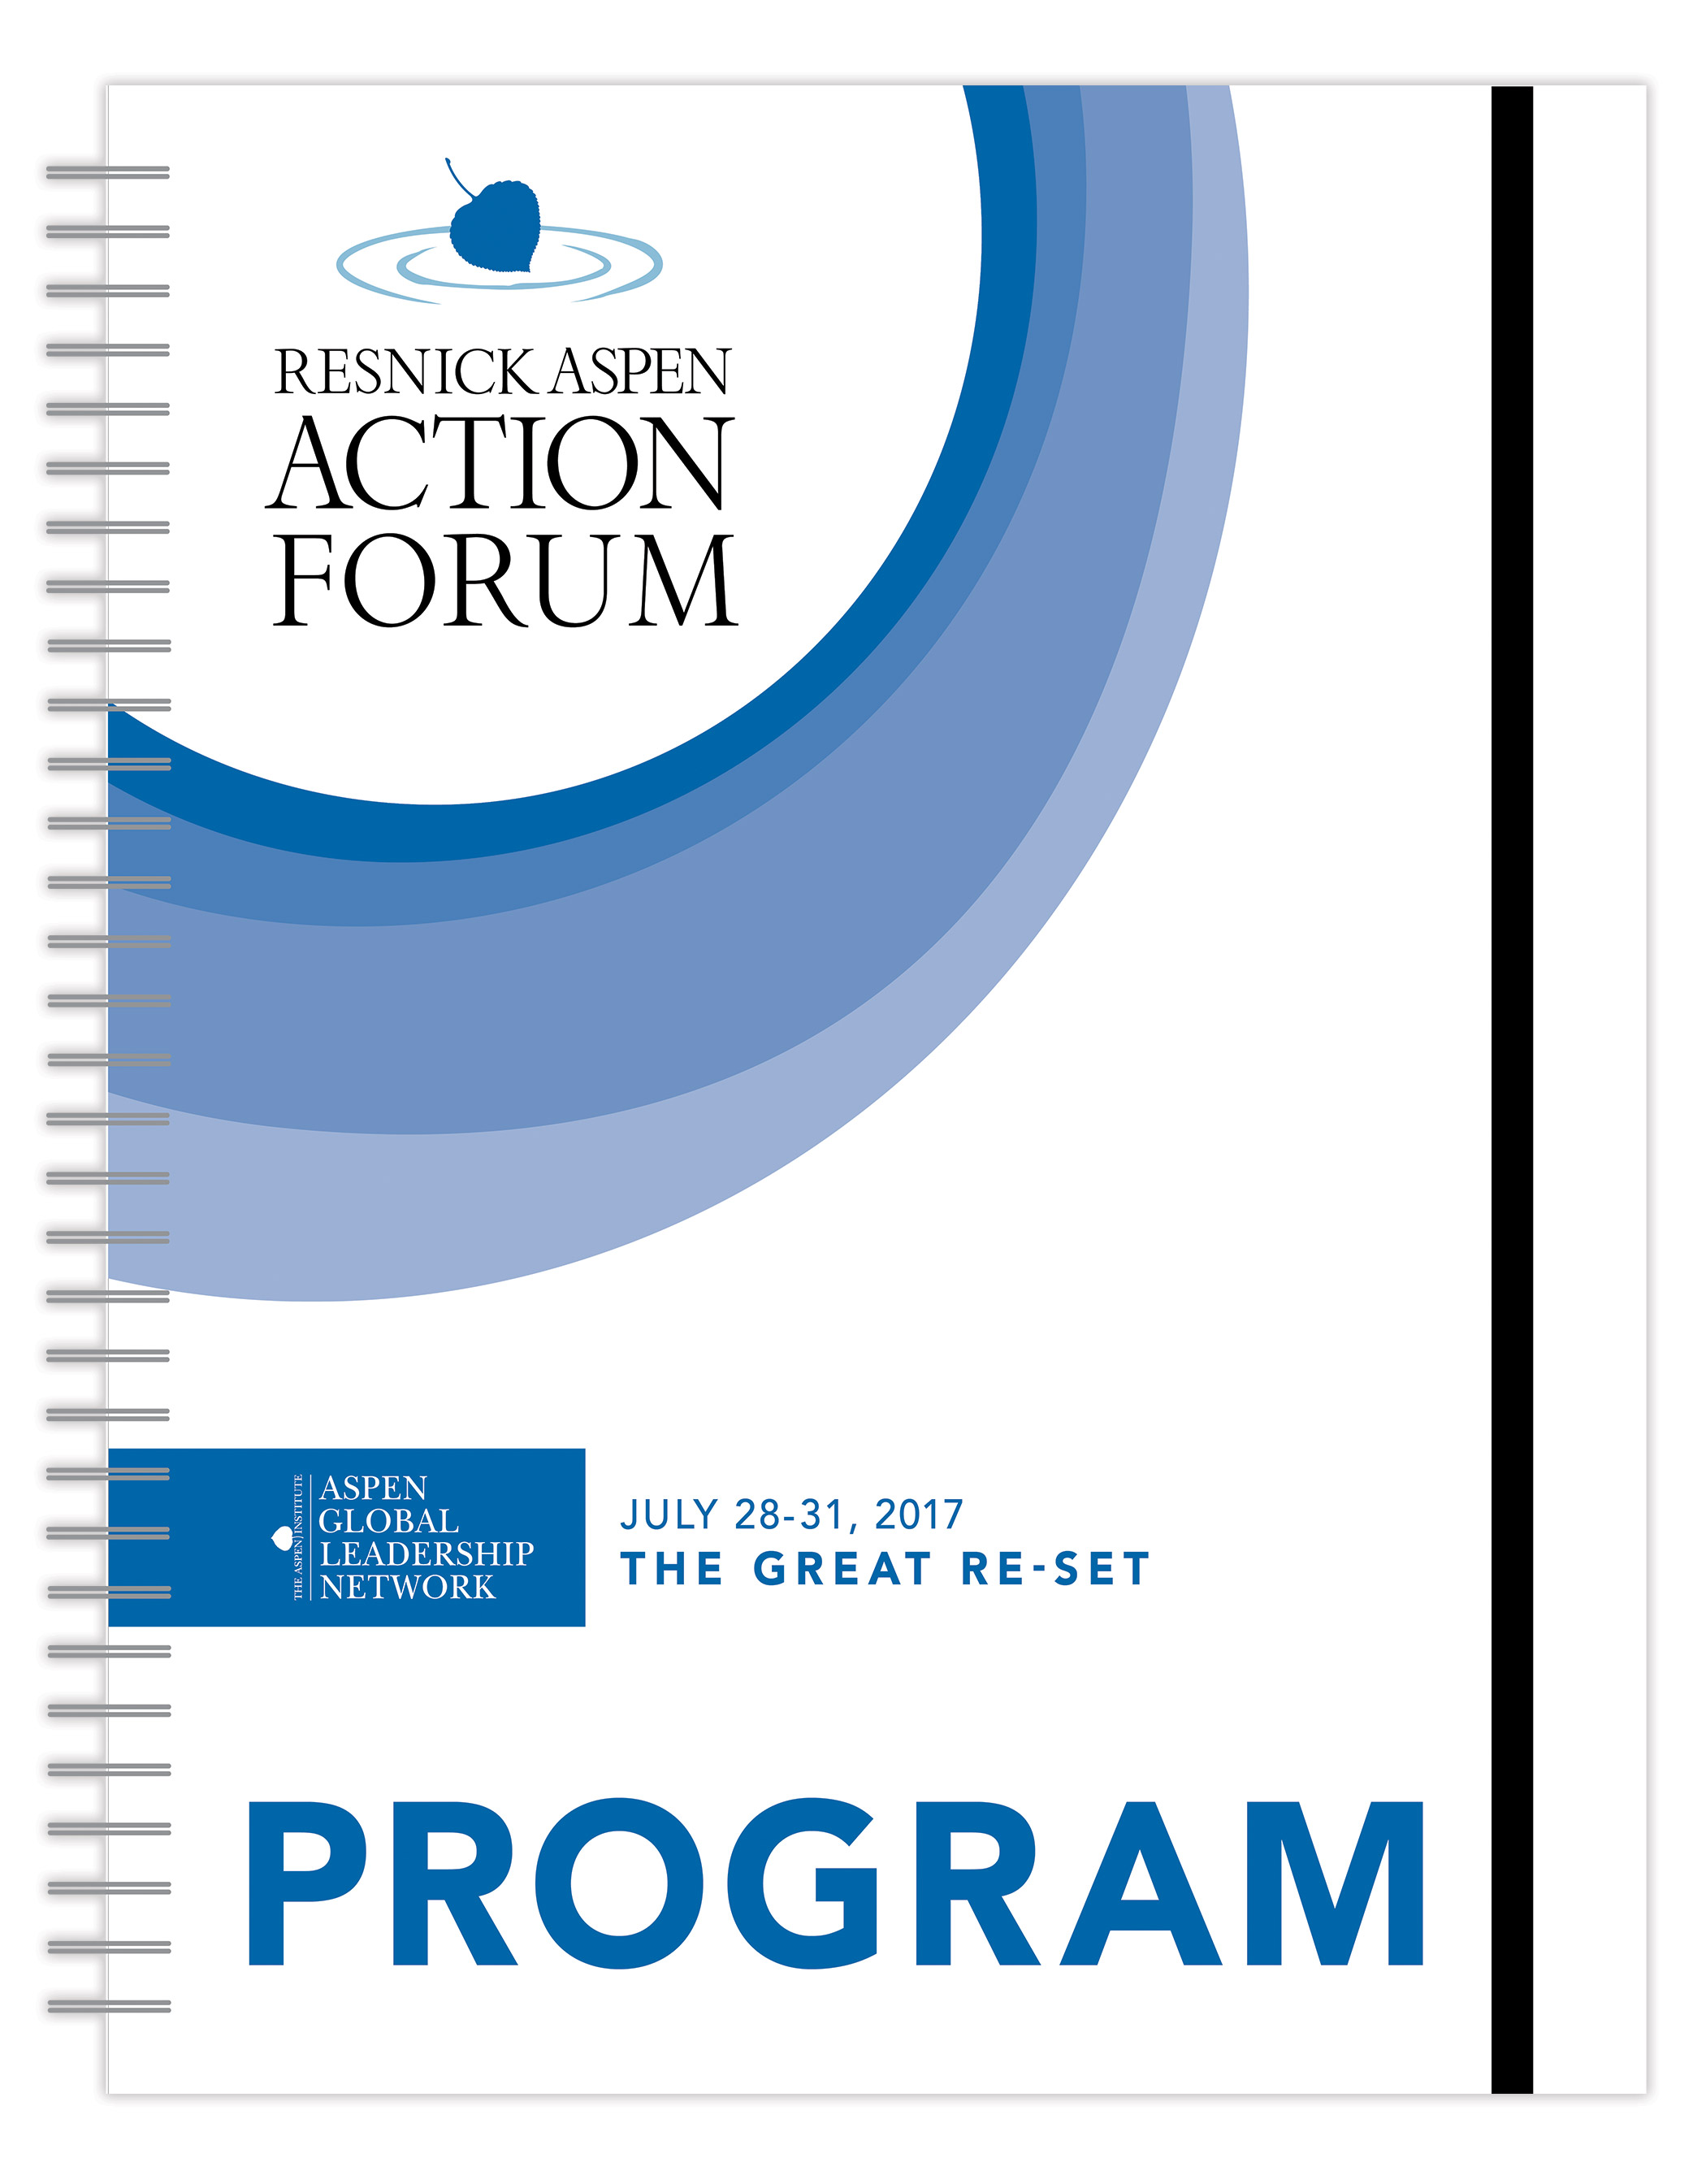 Resnick Aspen Action Forum Event Program Cover | Nonprofit Event Program Design by The Qurious Effect.